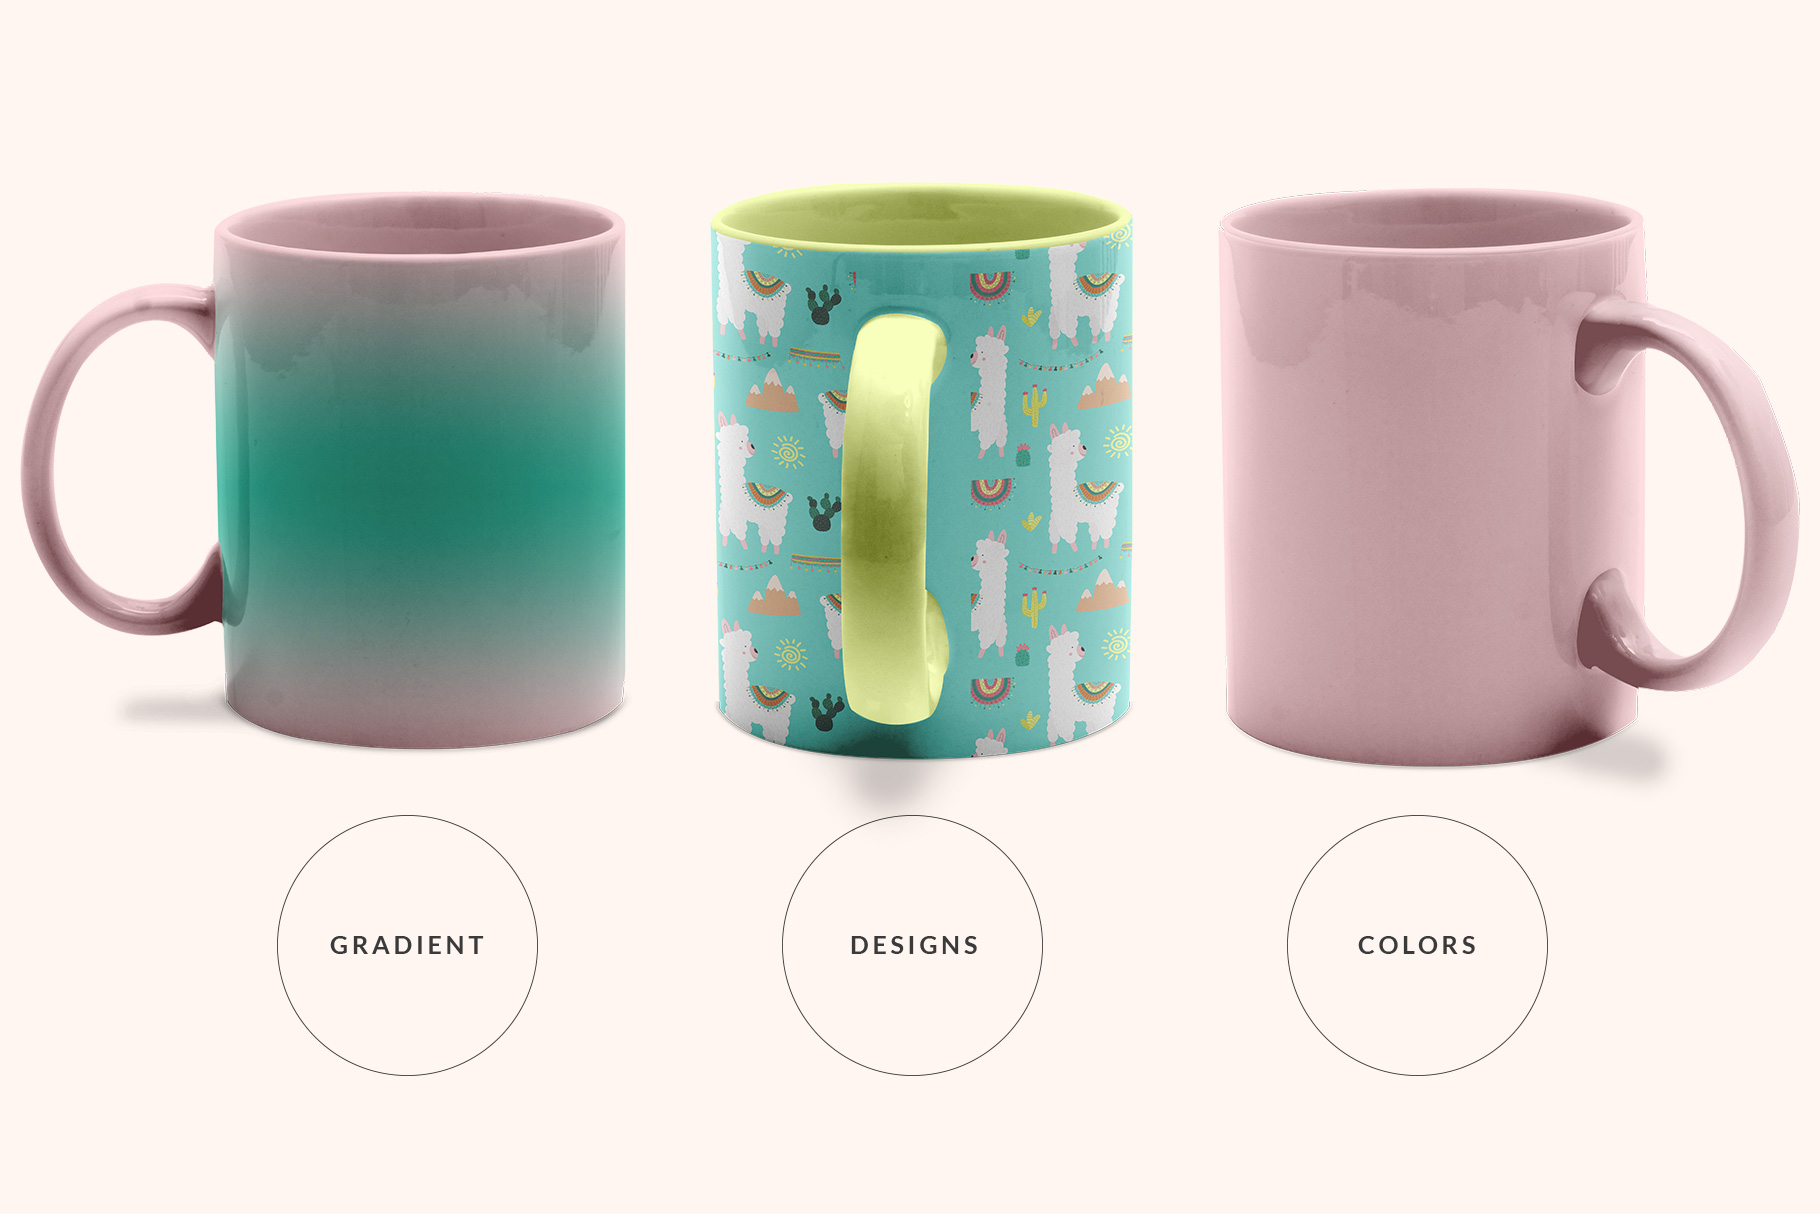 types of the ceramic coffee mugs mockup set